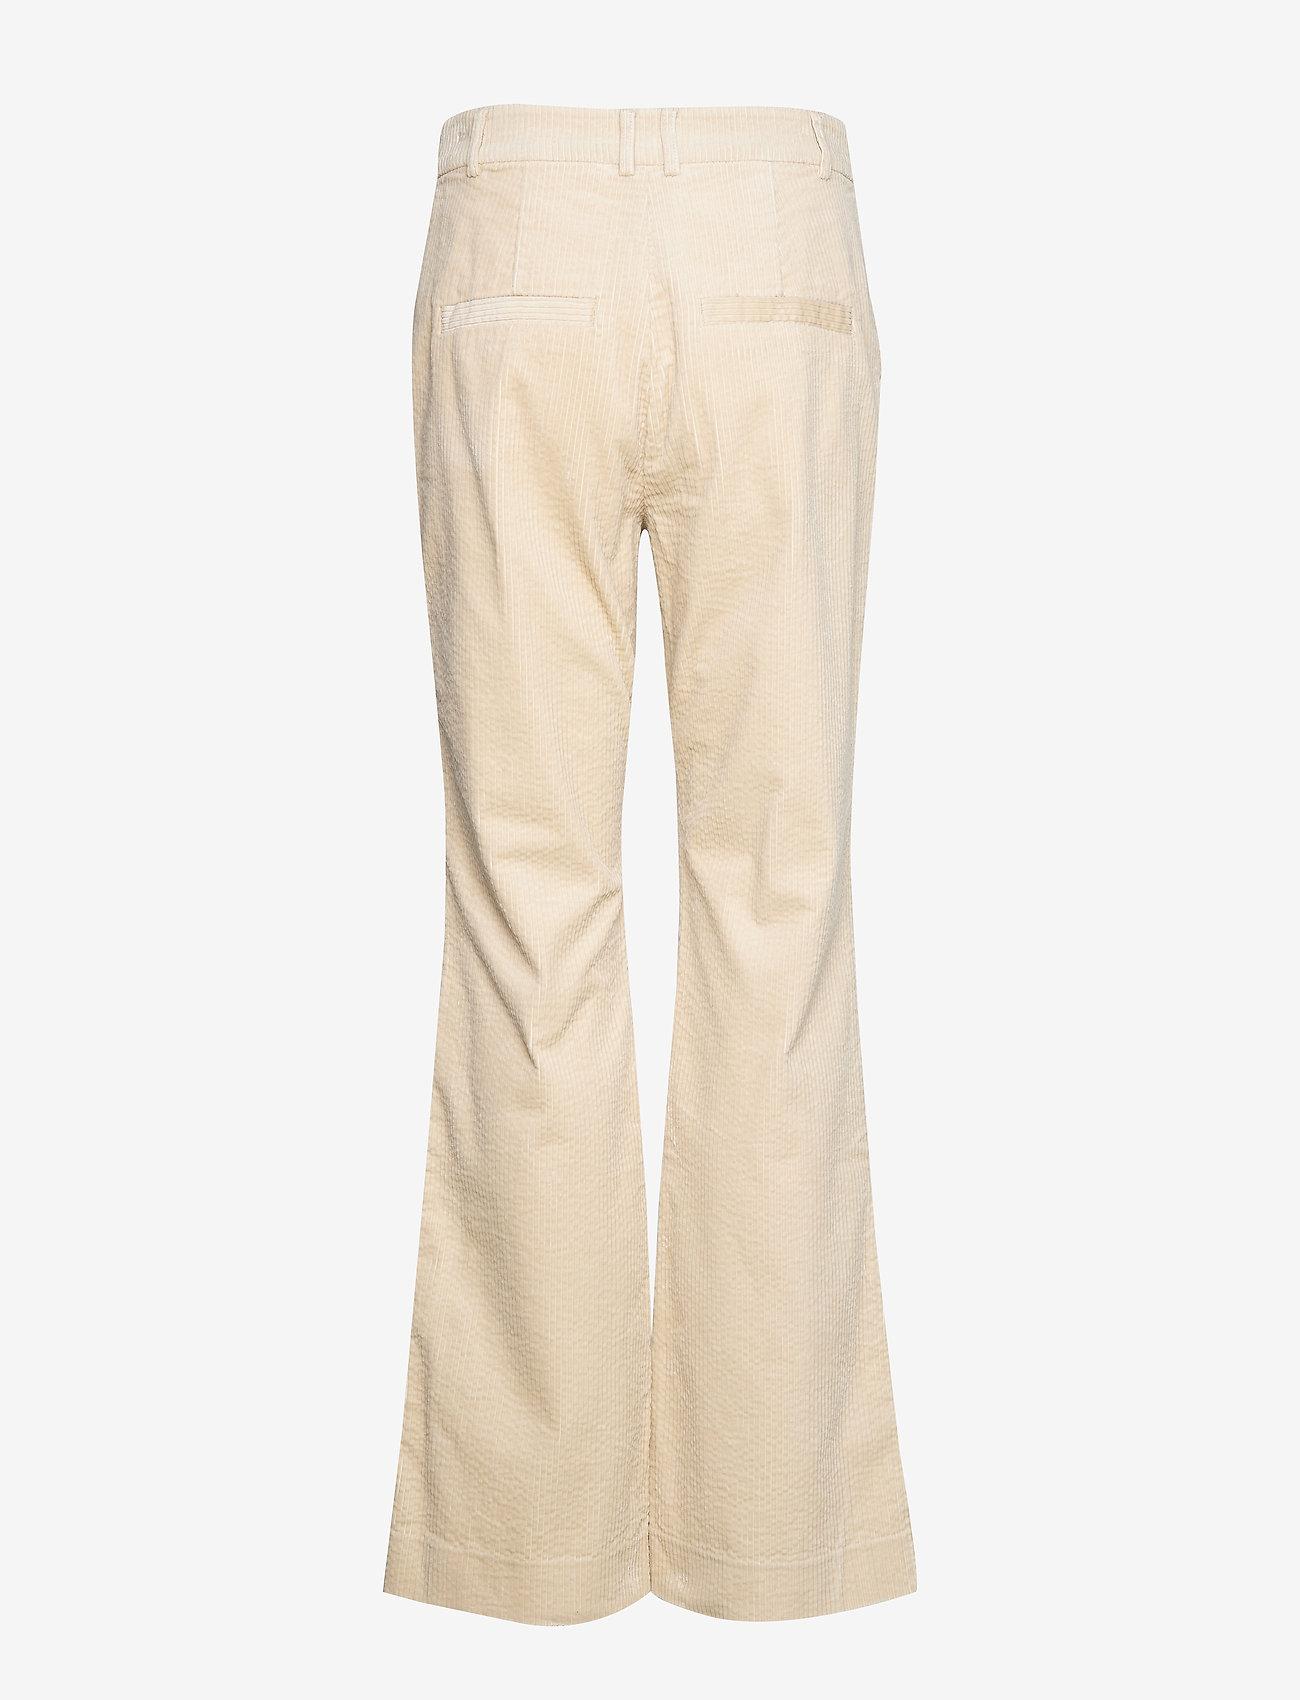 Noa Noa - Trousers - uitlopende broeken - oatmeal - 1